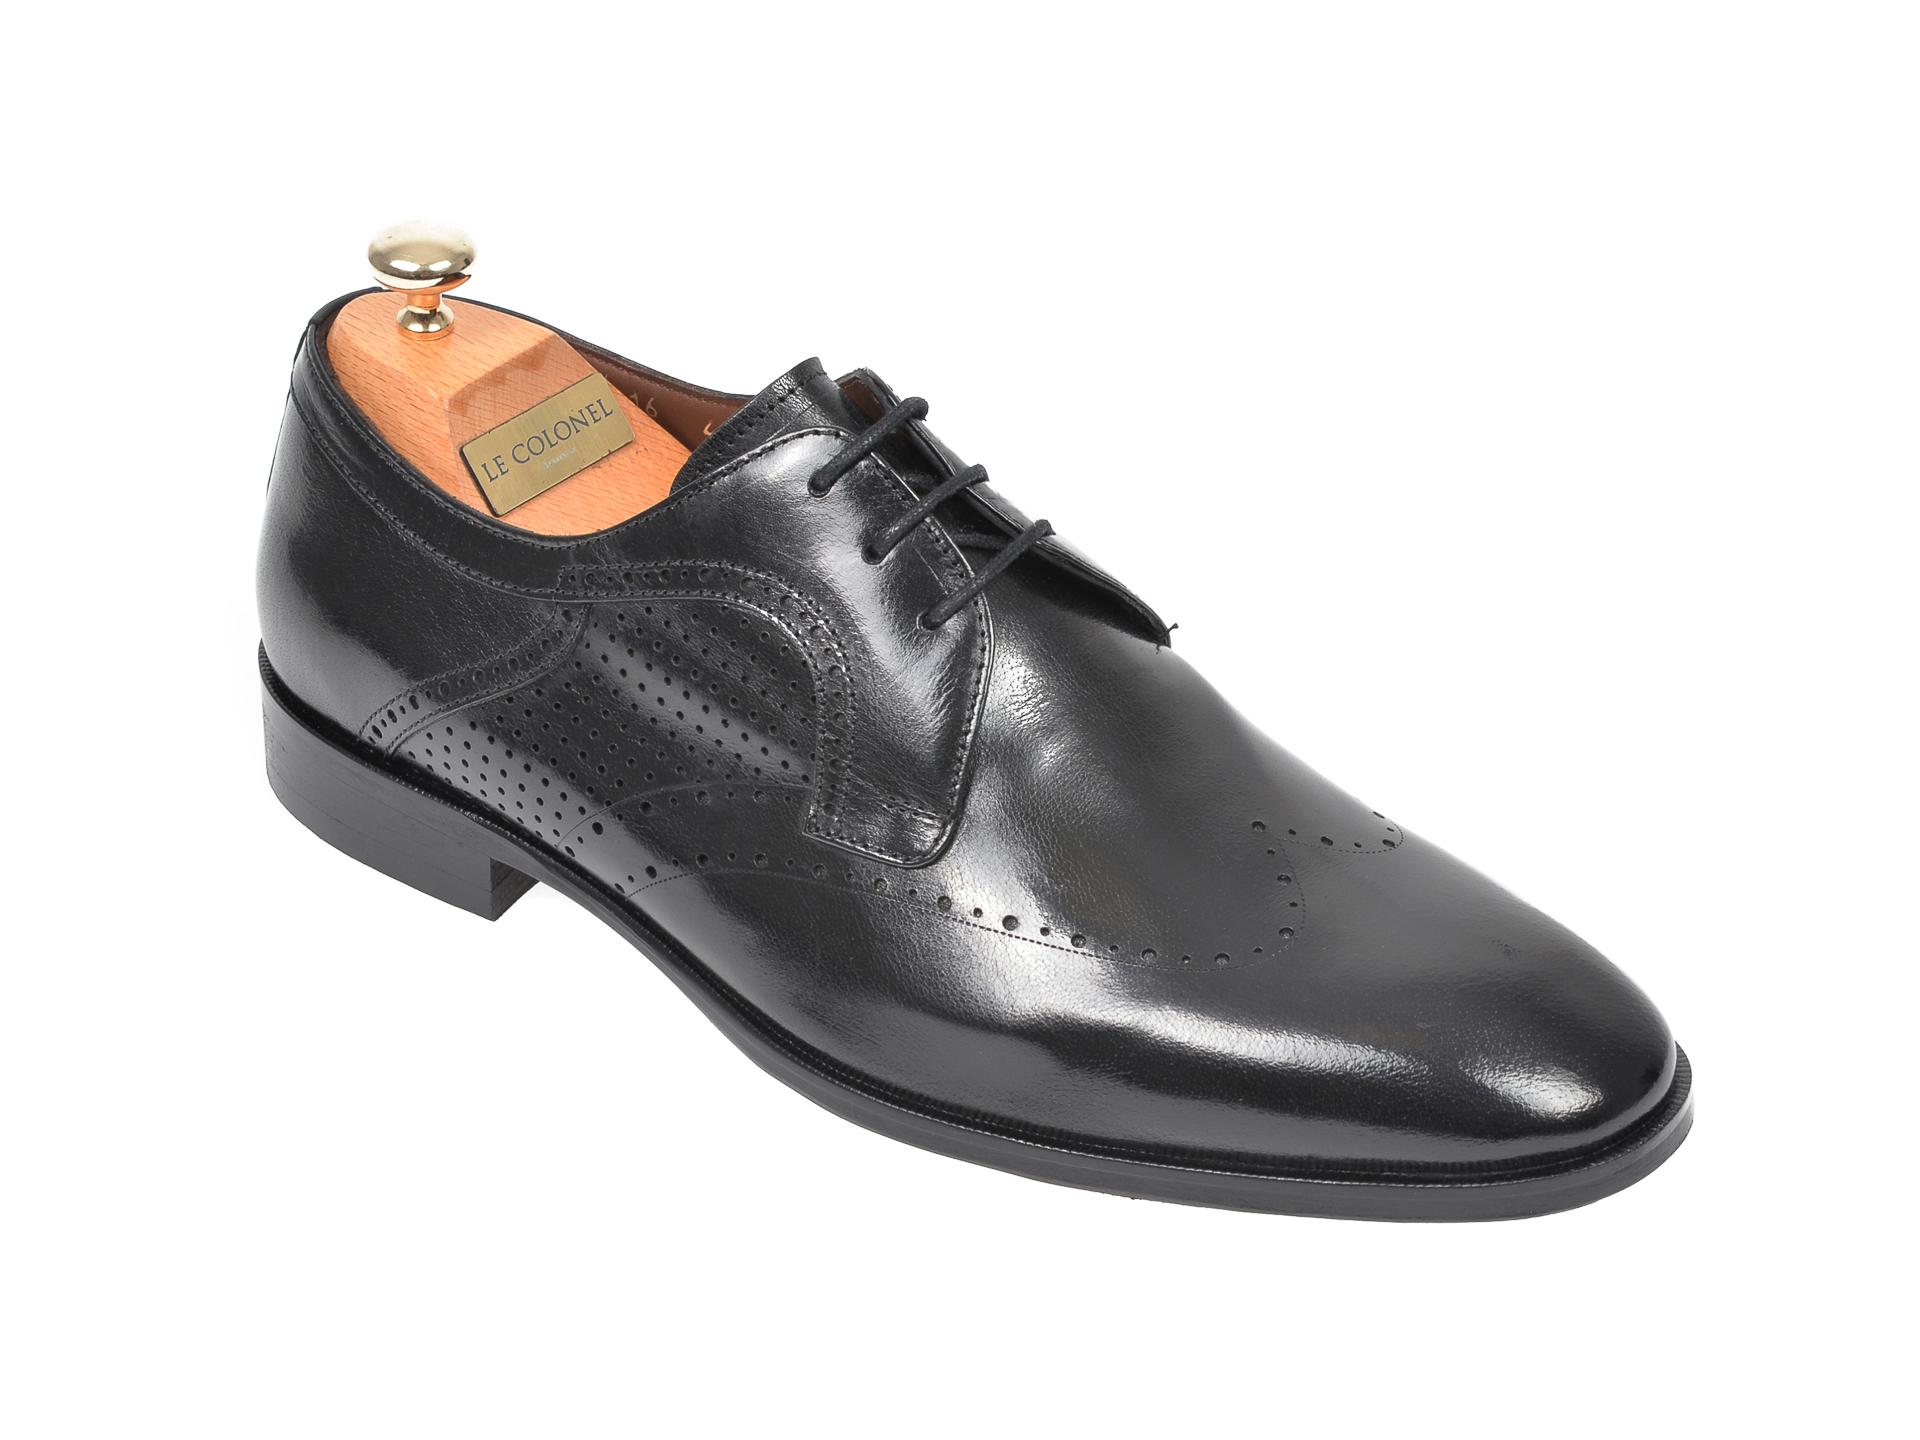 Pantofi LE COLONEL negri, 48716, din piele naturala imagine